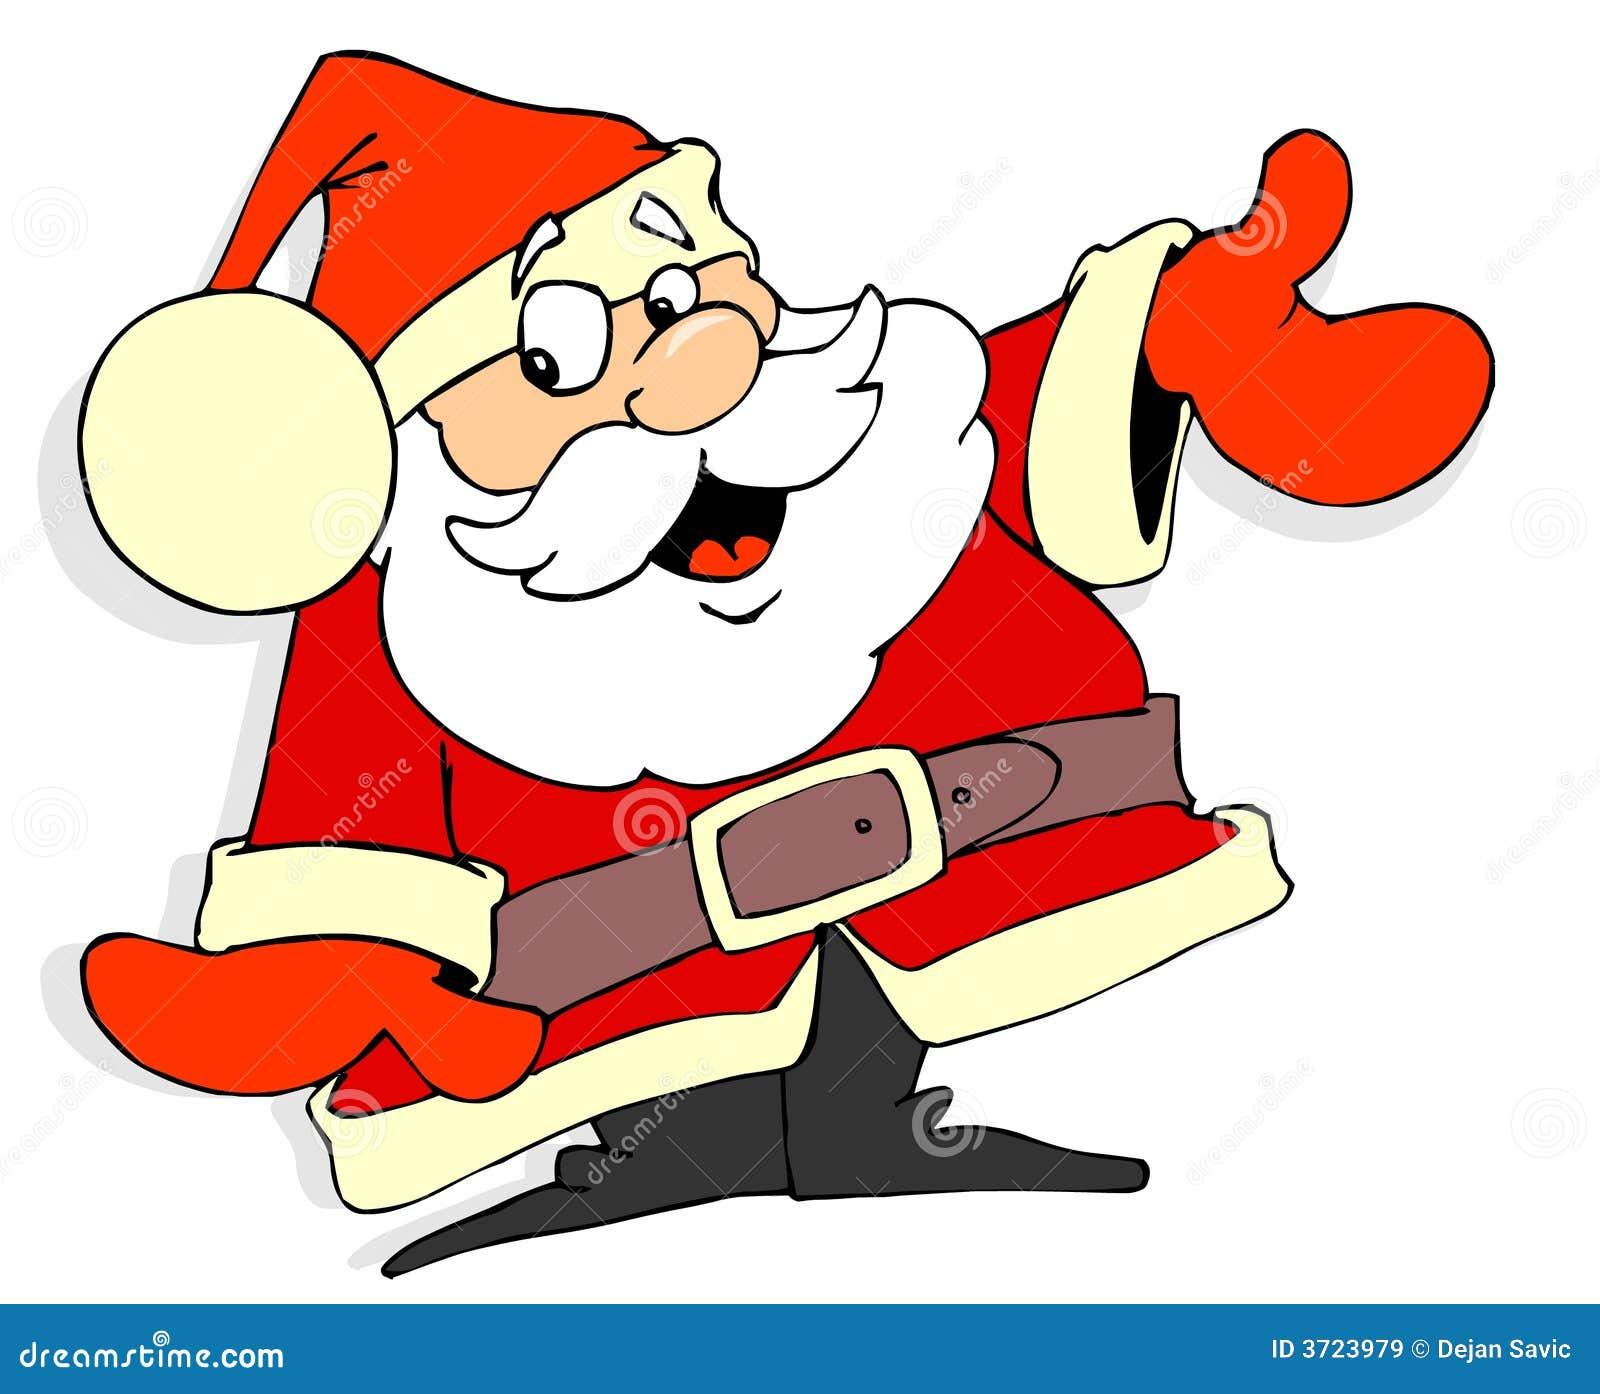 Dessin Animé Du Père Noël Illustration Stock Illustration